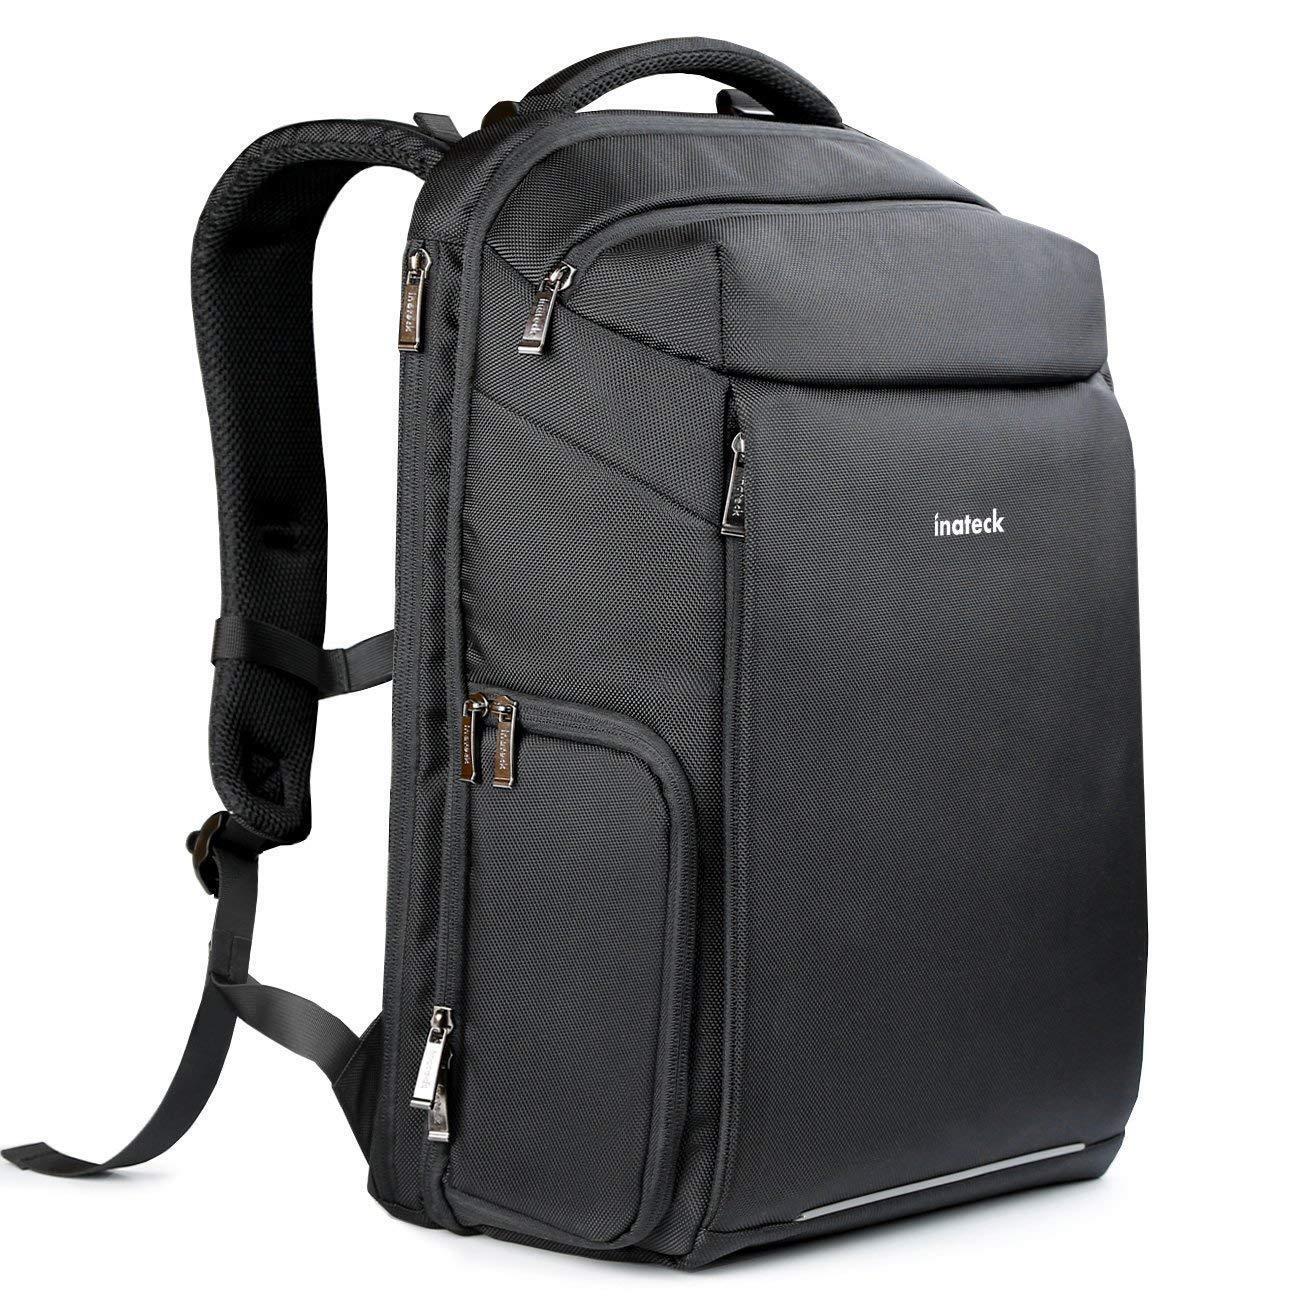 Inateck DSLR Kamera-Rucksack mit Laptop-Fach,Reiserucksack 15-15,6 Zoll Laptops